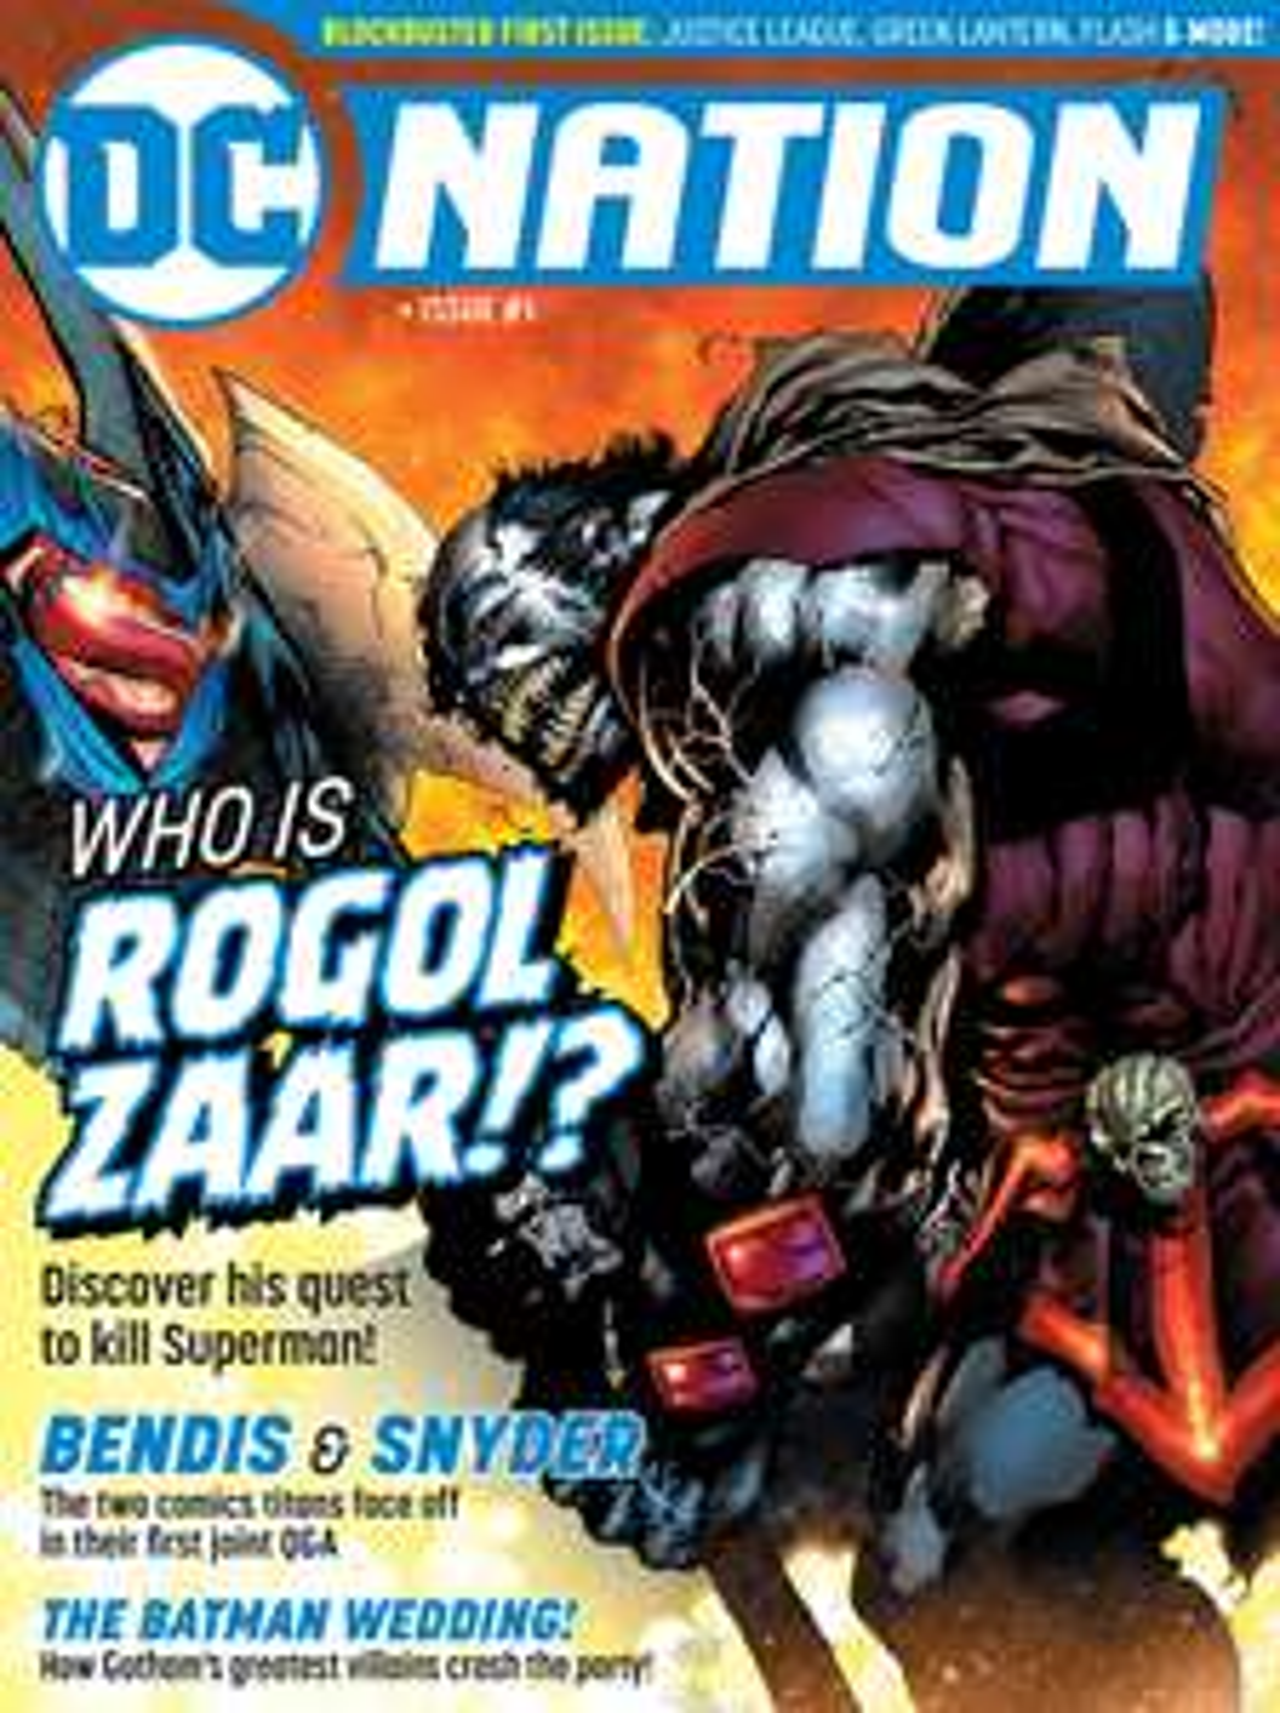 Comixology - DC Nation #1 monthly digital magazine - Free